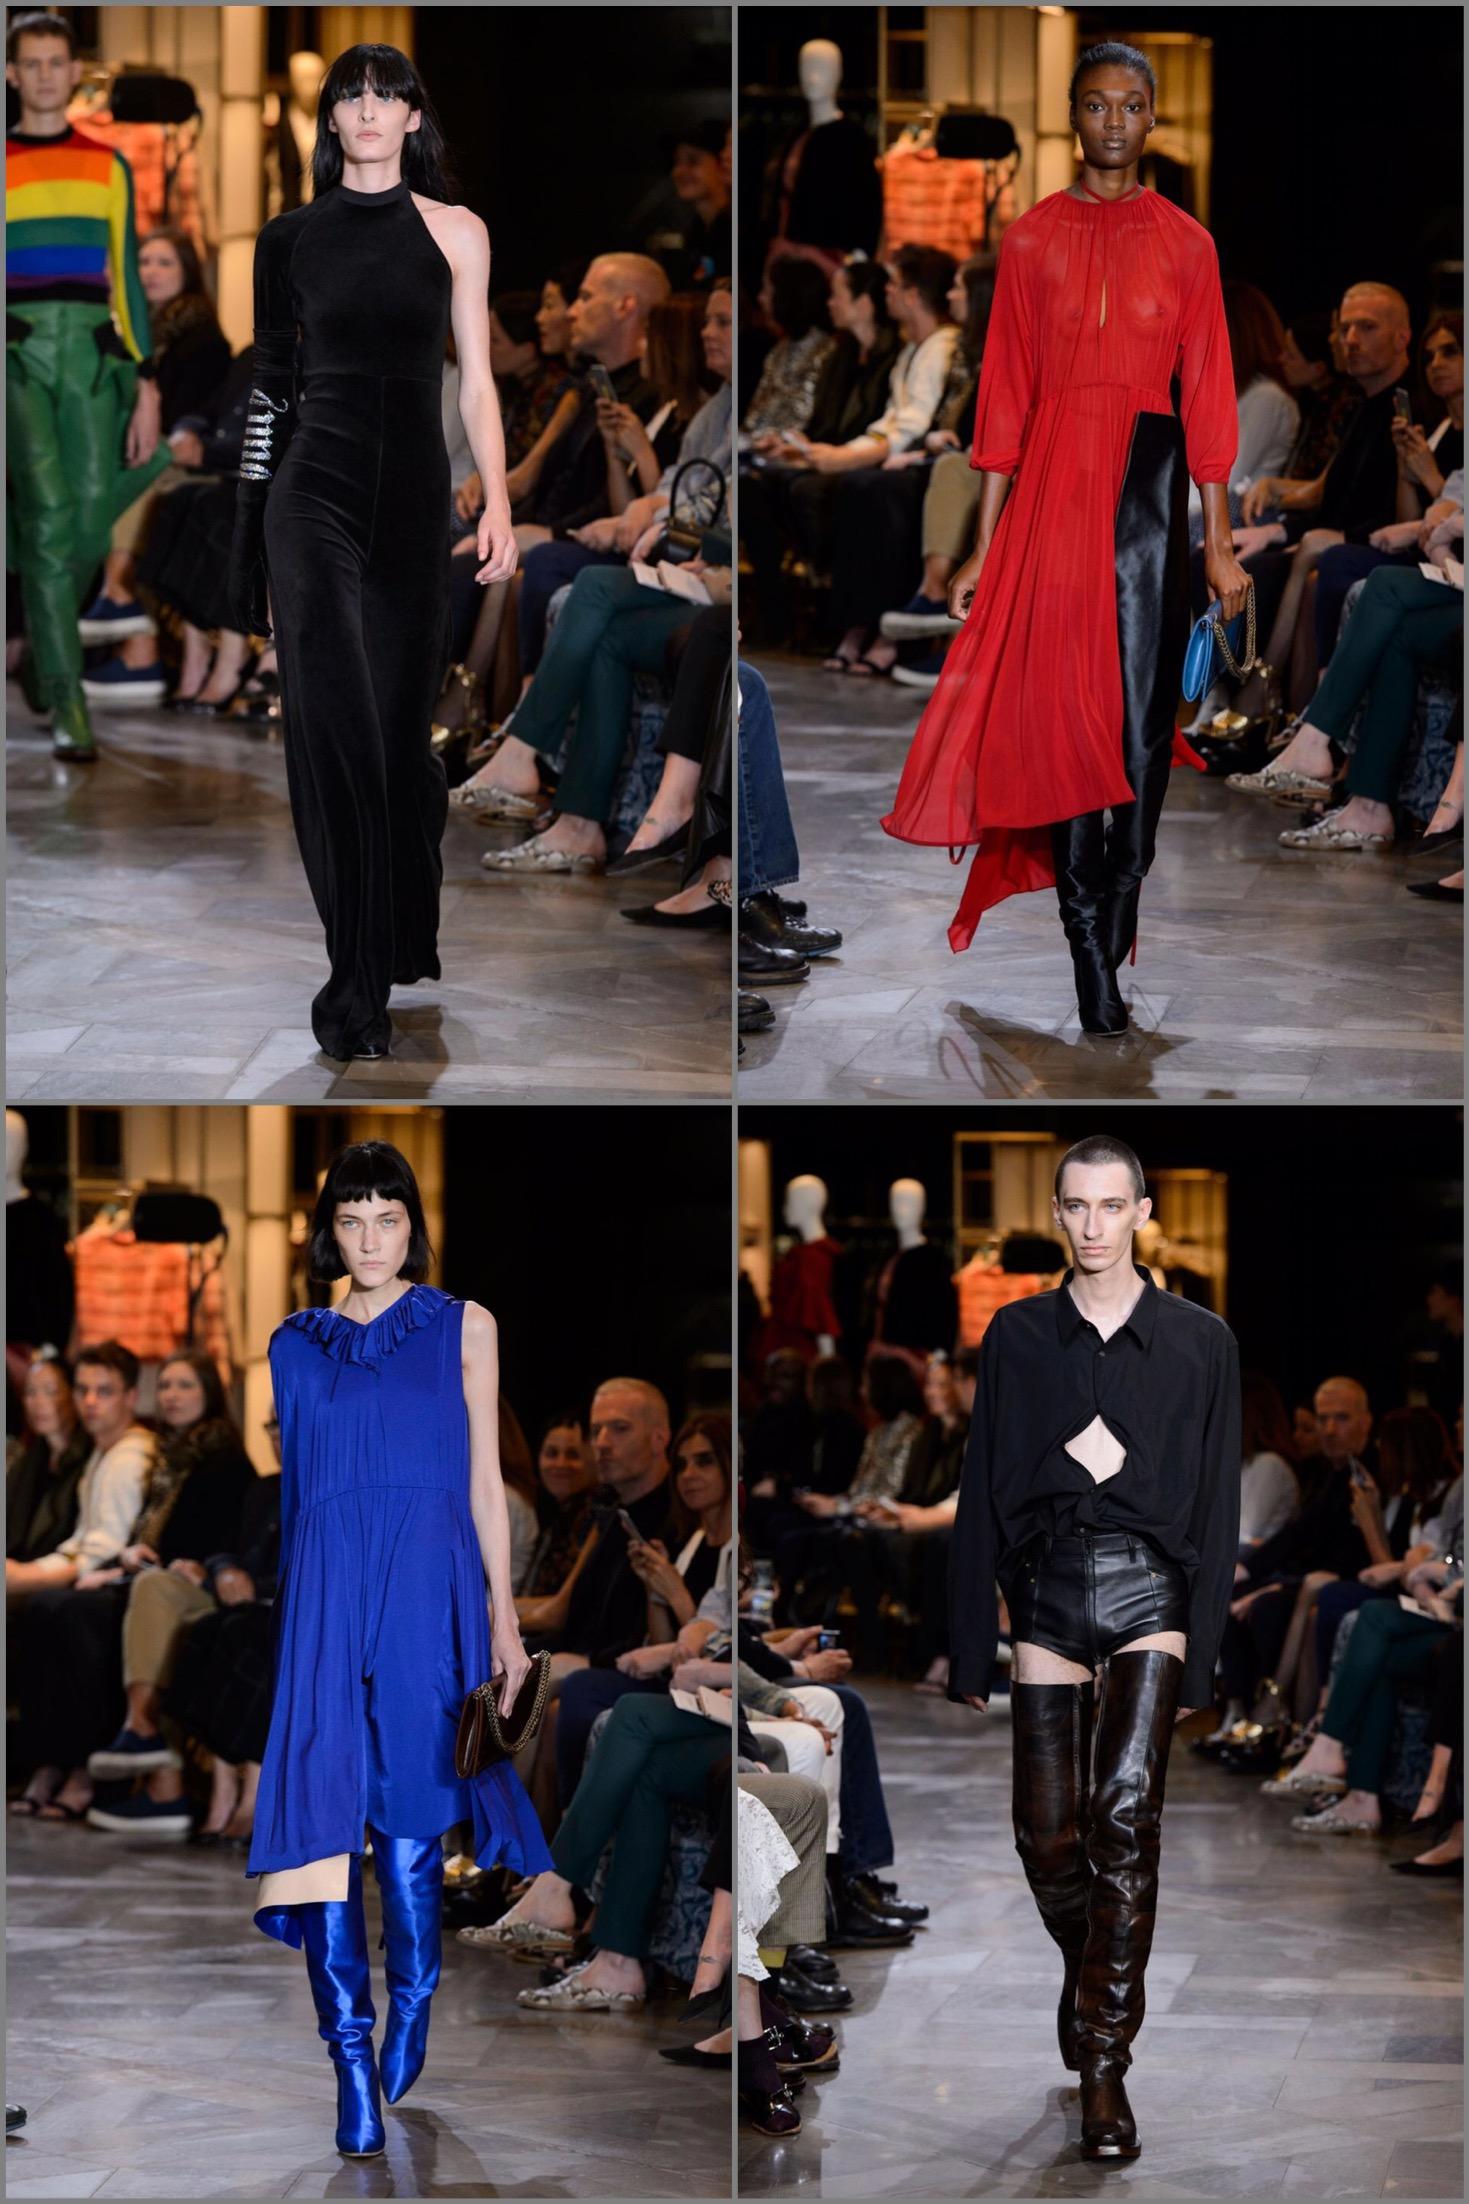 Paris Couture Week Fall Winter 2016-2017 - Vêtements